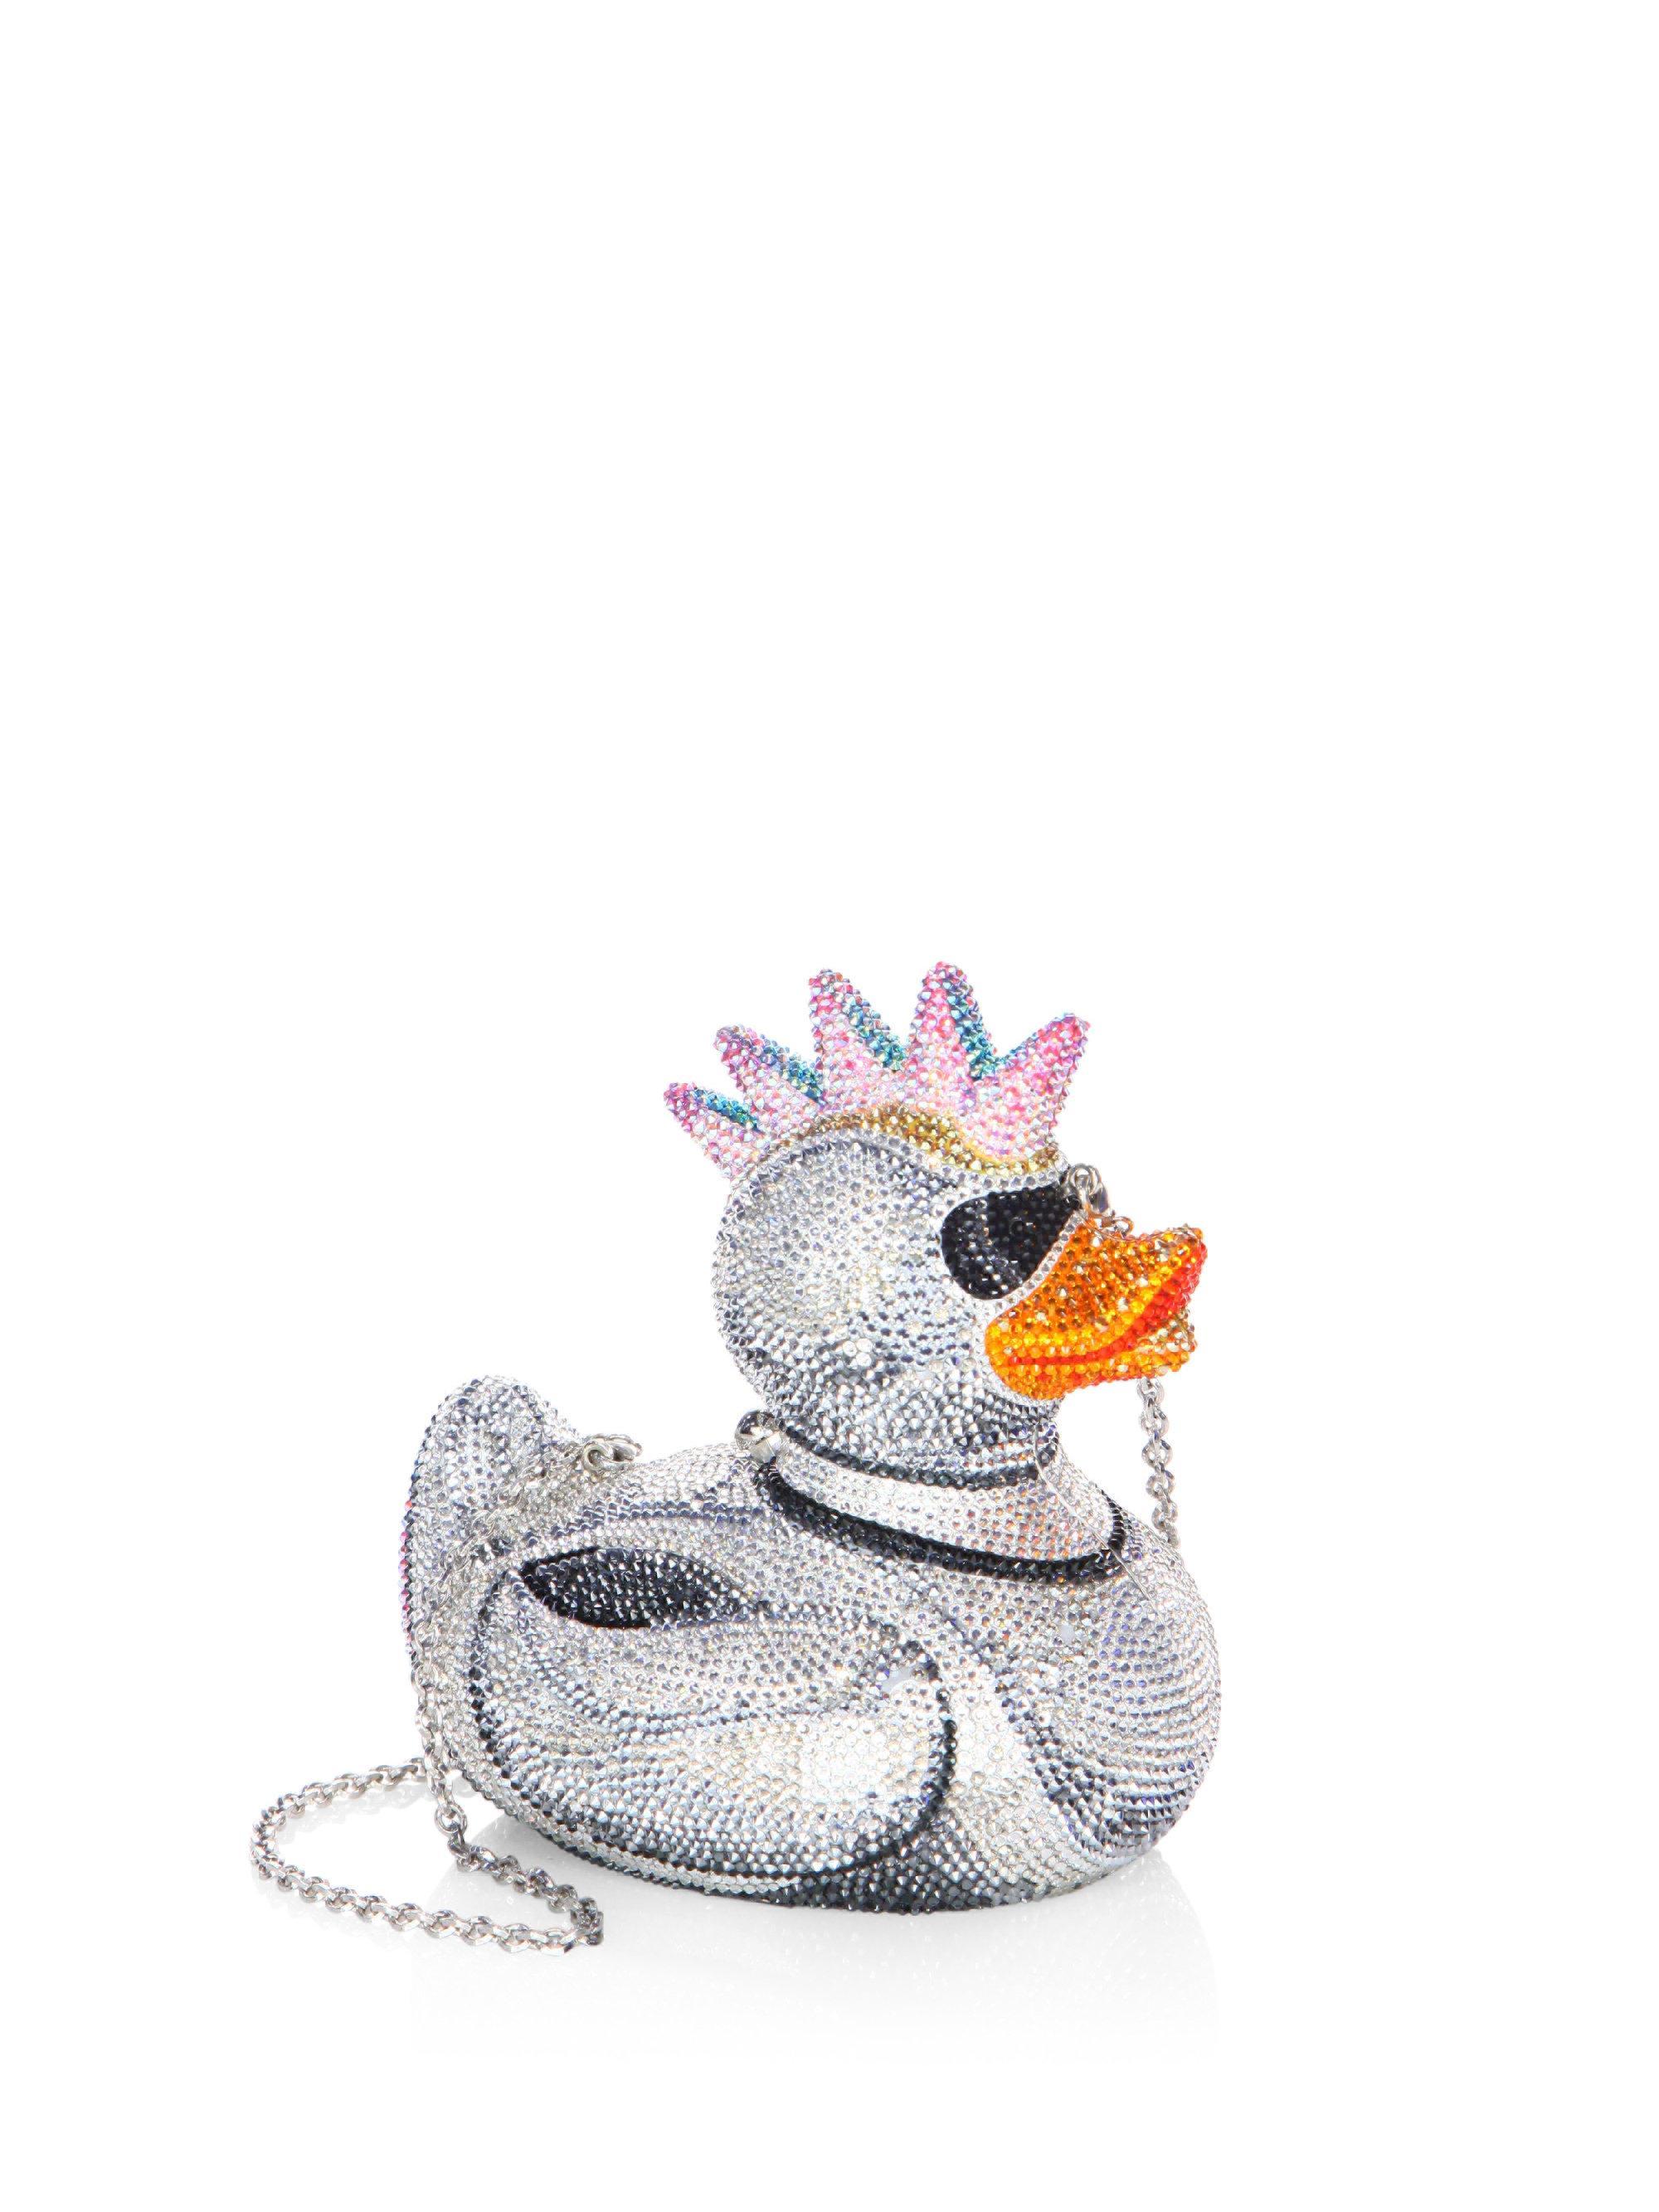 411112470 Judith Leiber Punk Duck Crystal Clutch Bag In Metallic Lyst